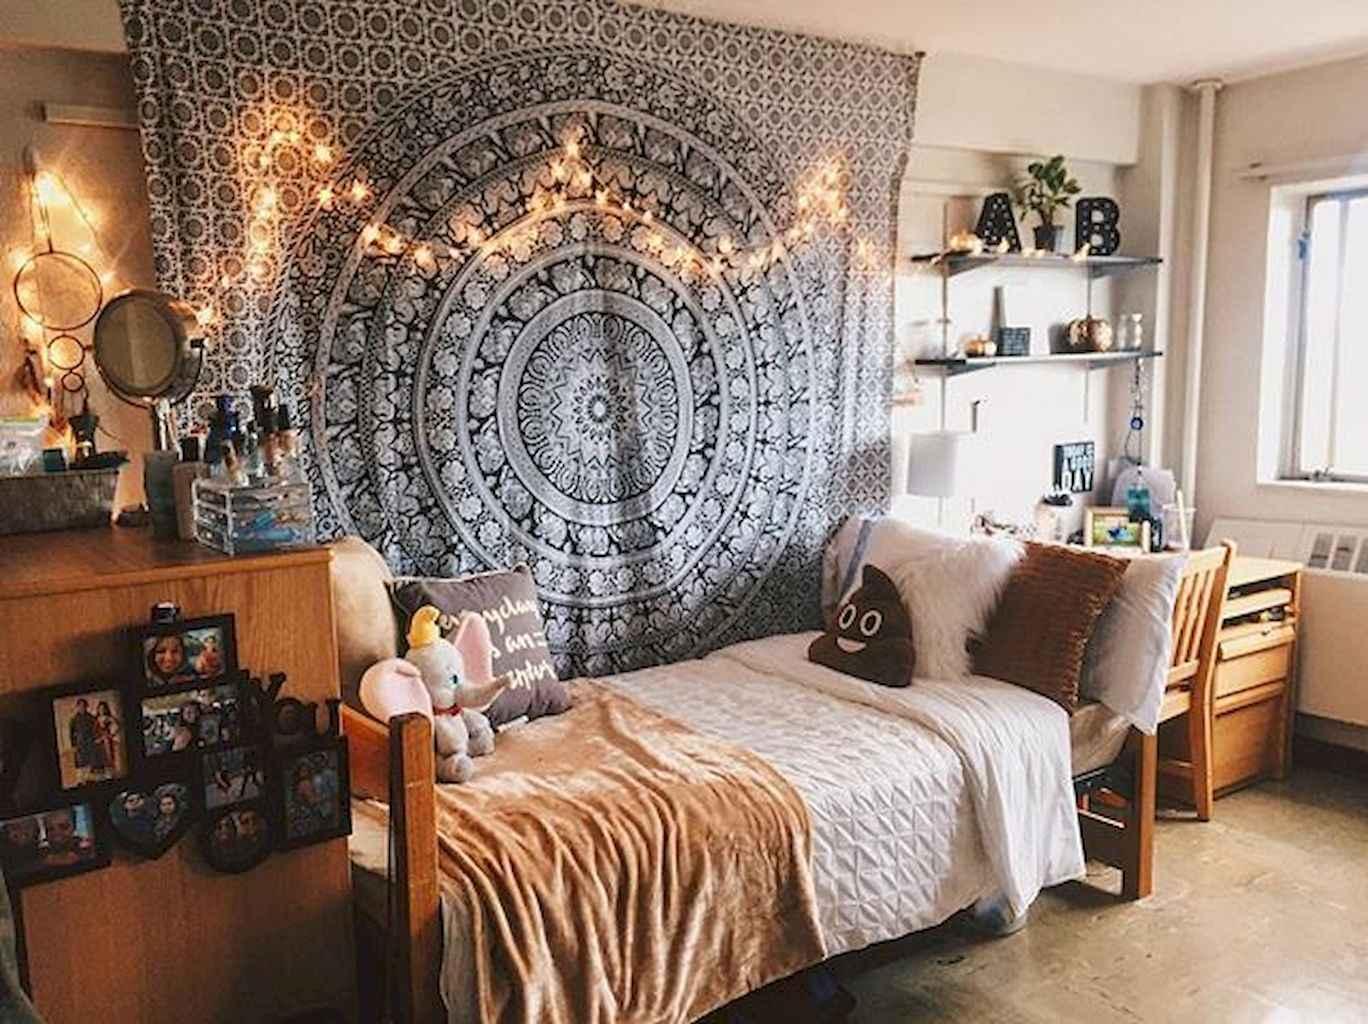 Cute diy dorm room decorating ideas on a budget (36)